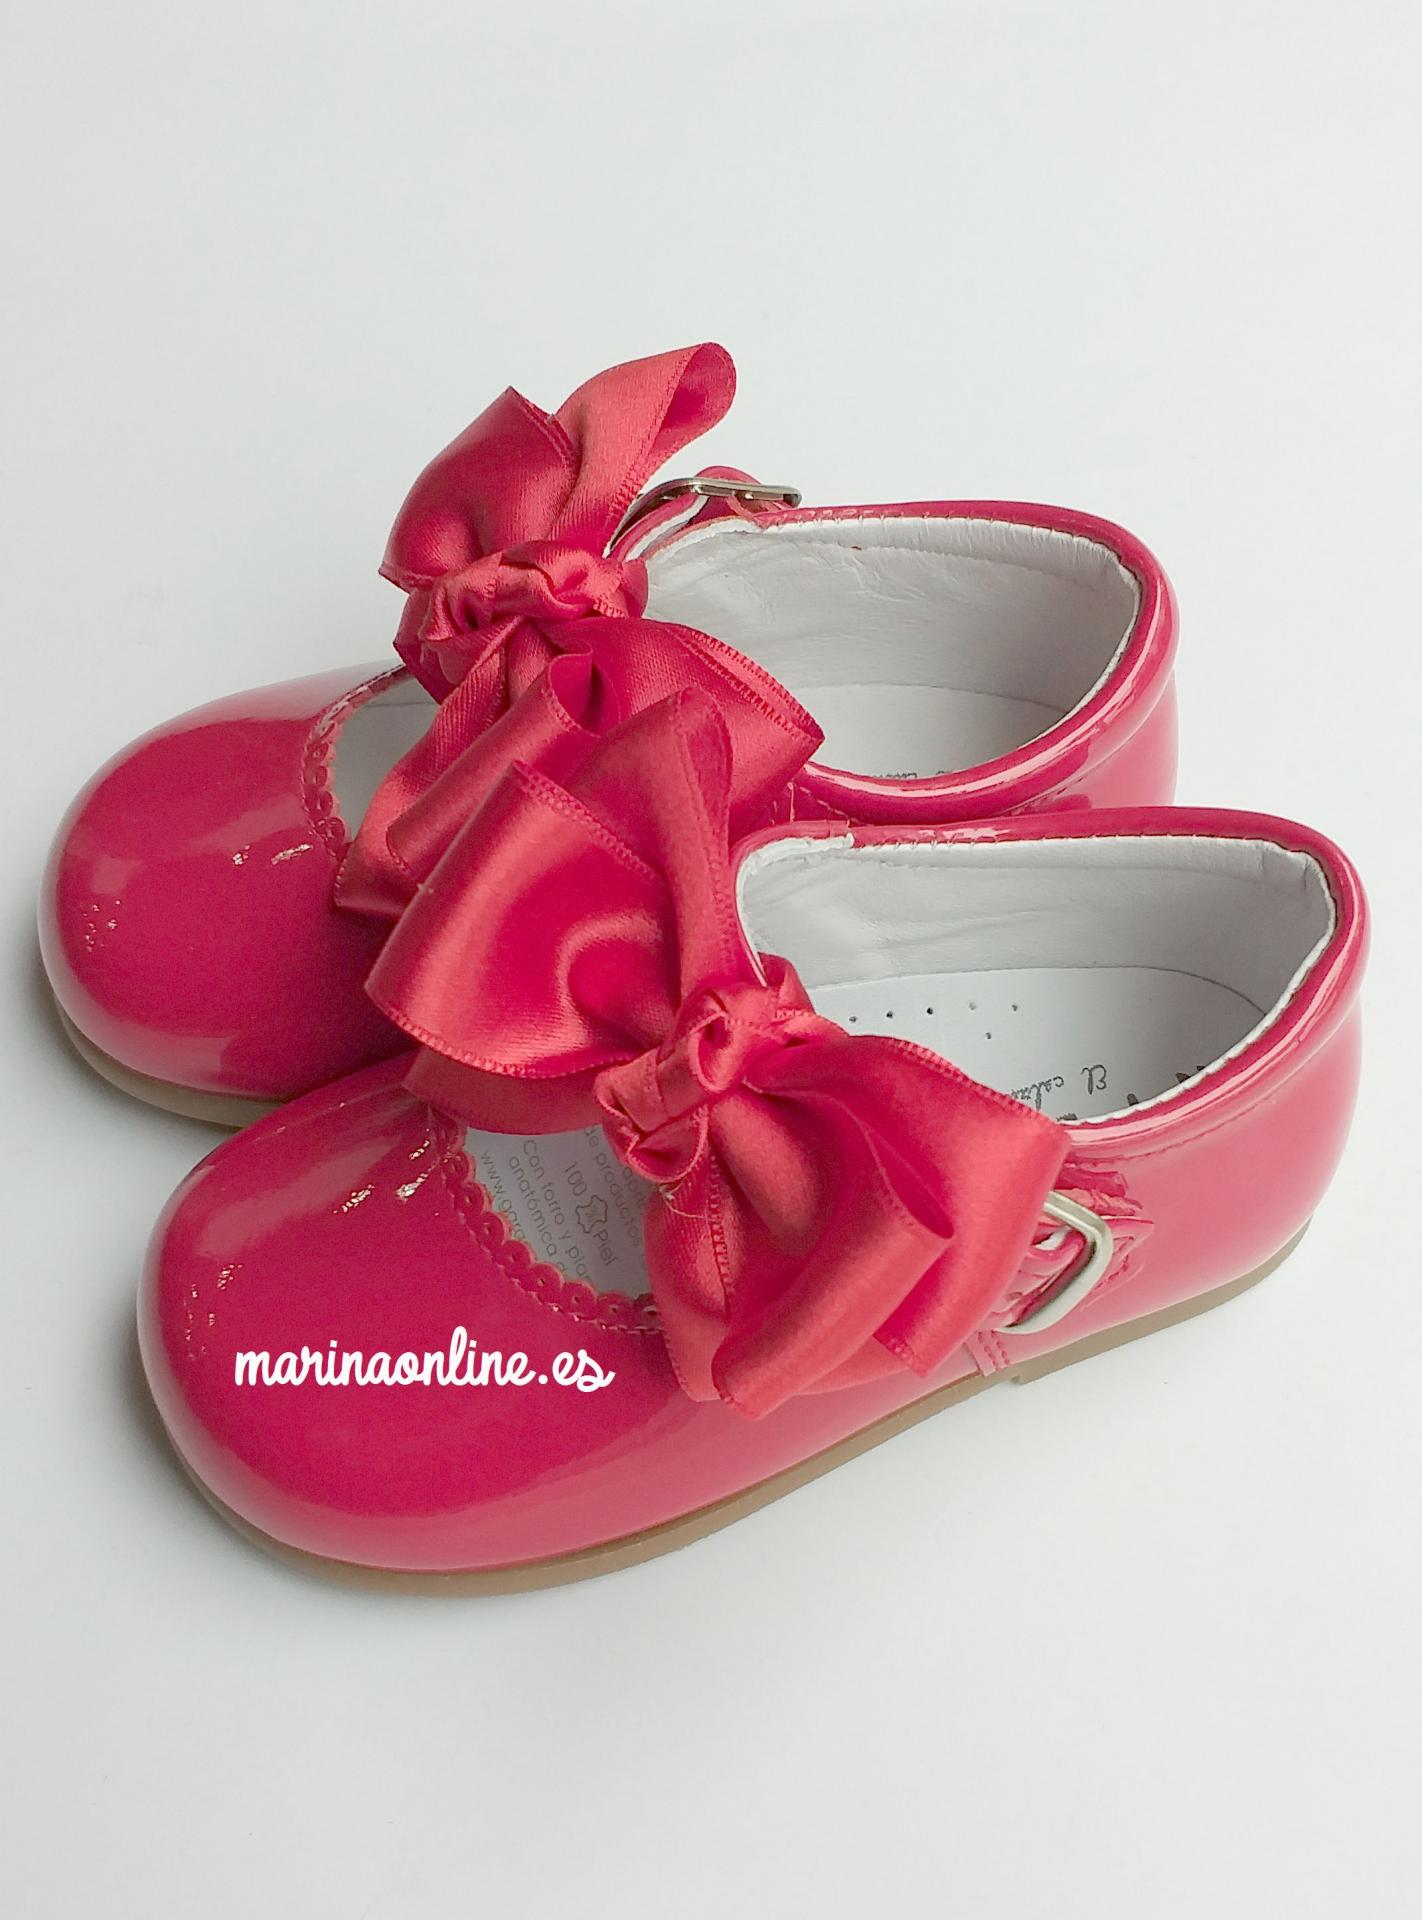 Merceditas Hebilla Charol Pearl Rojo Lazo REF: 11309